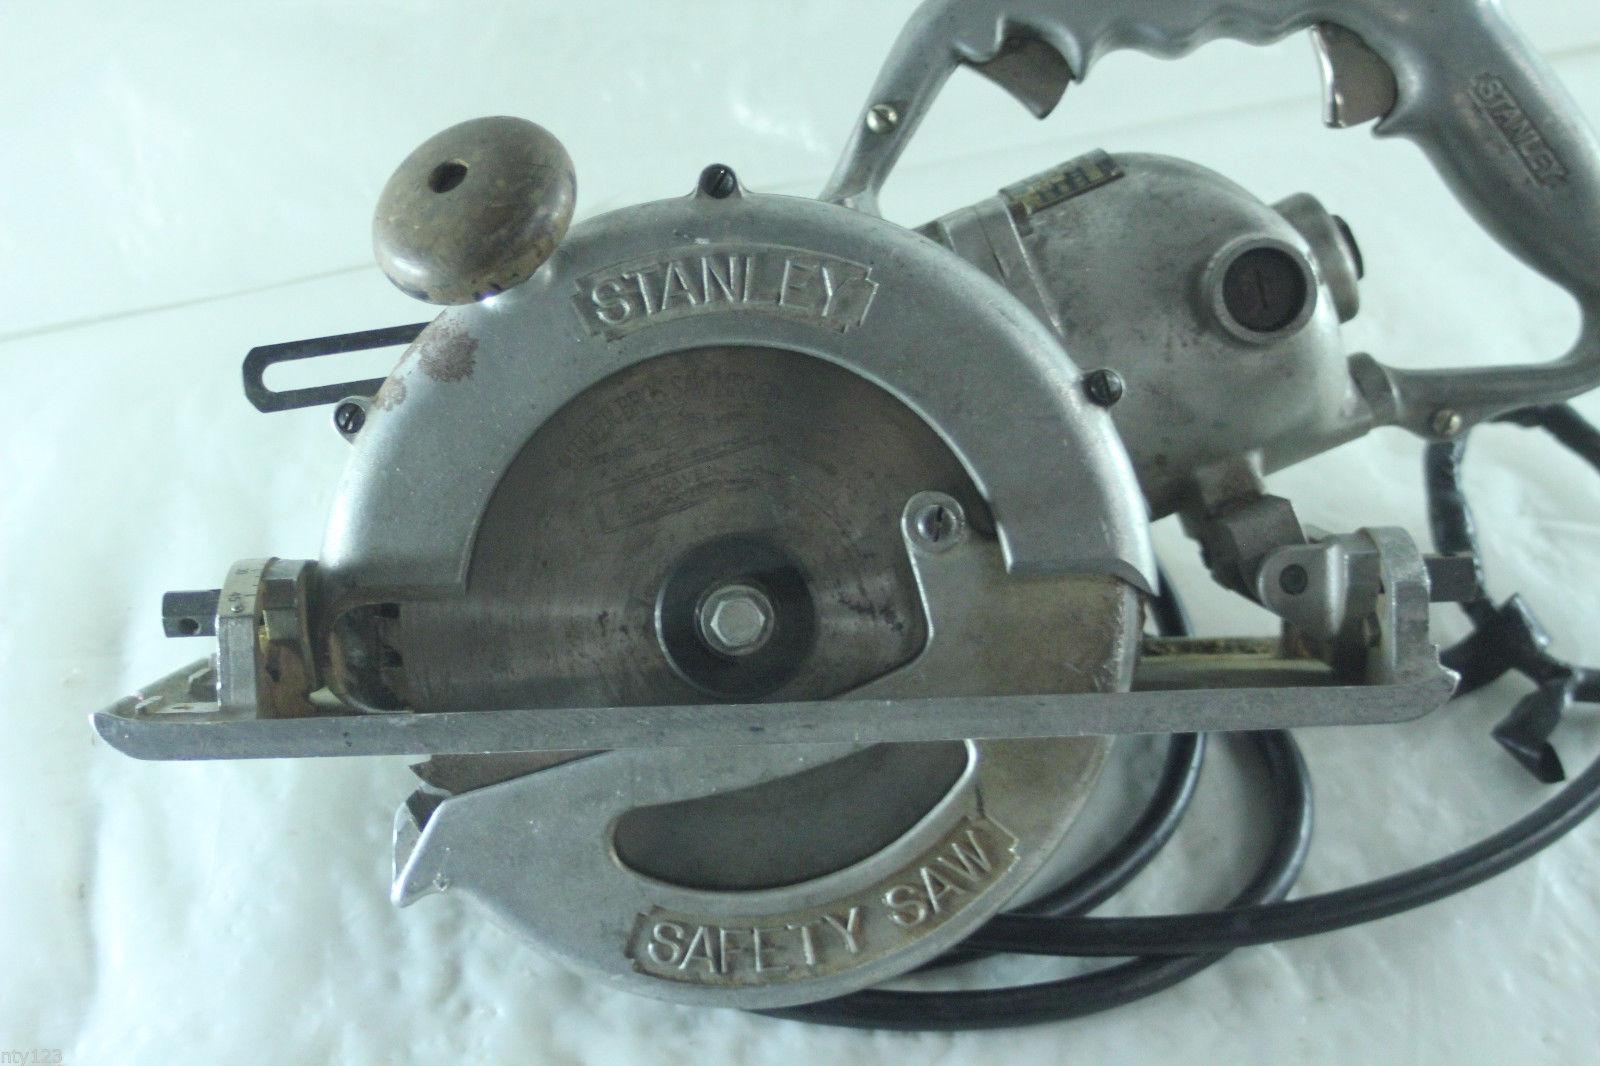 Vintage Circular Saws 50